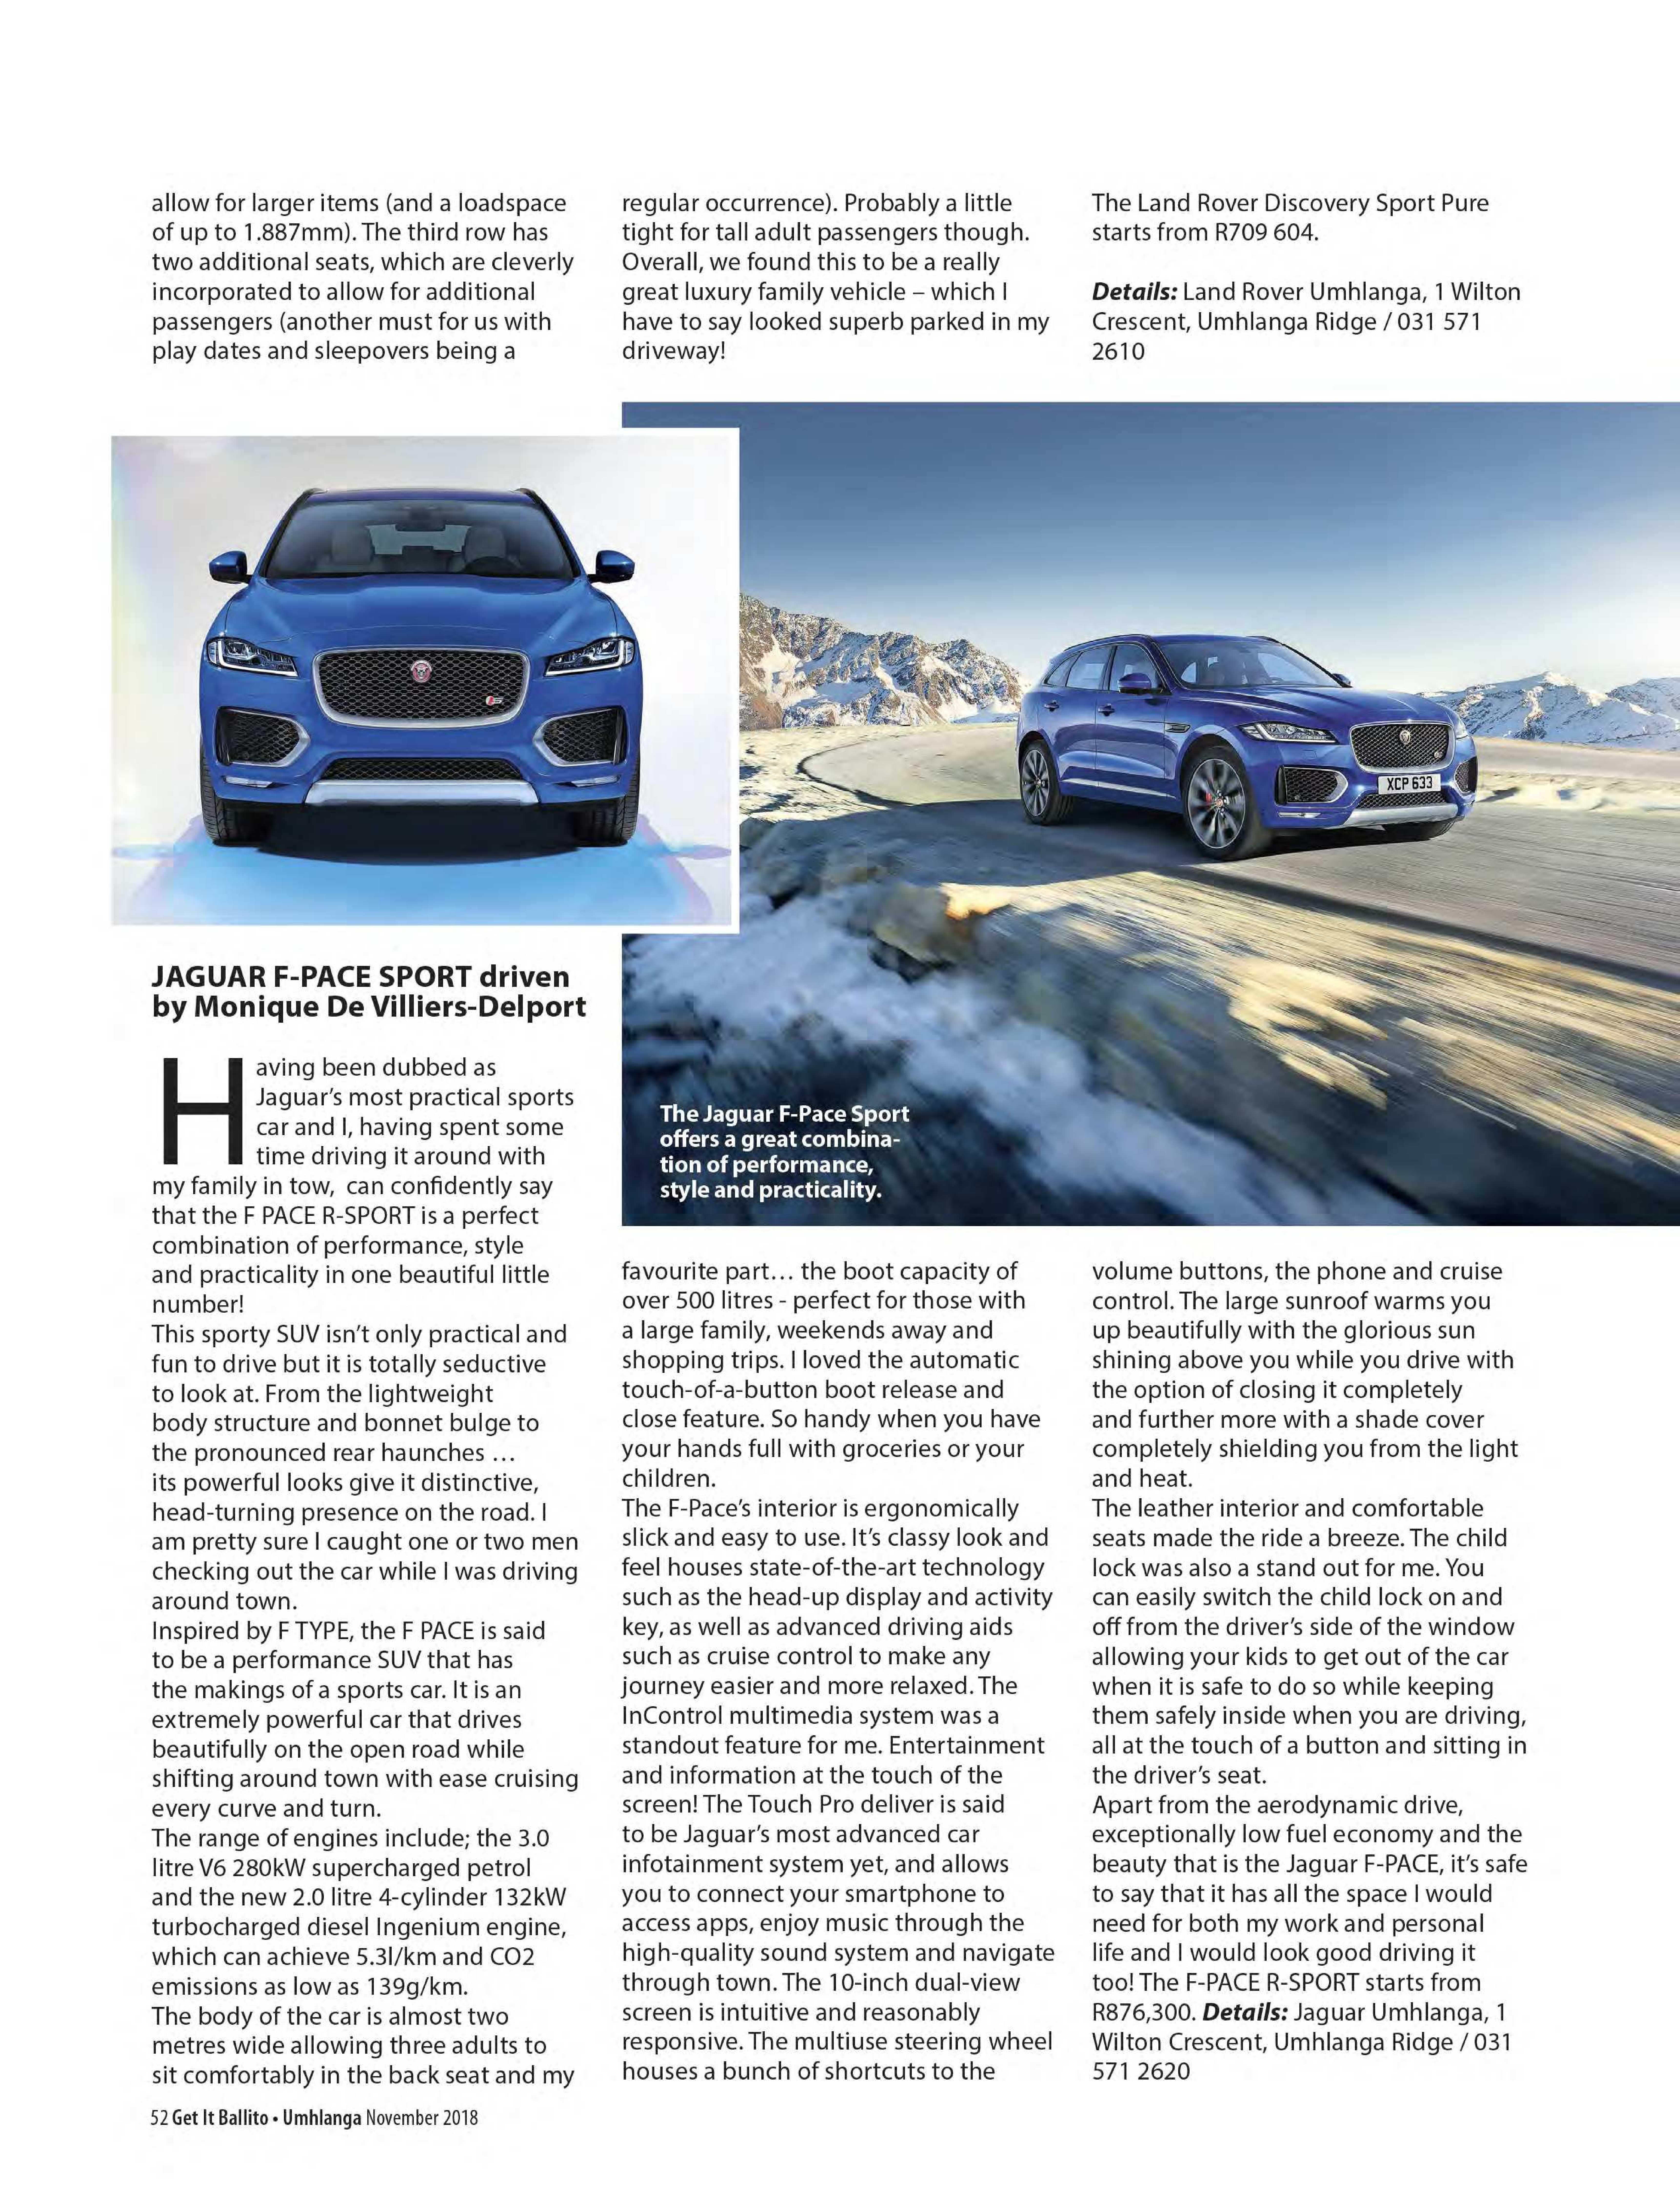 get-magazine-ballitoumhlanga-november-2018-epapers-page-54